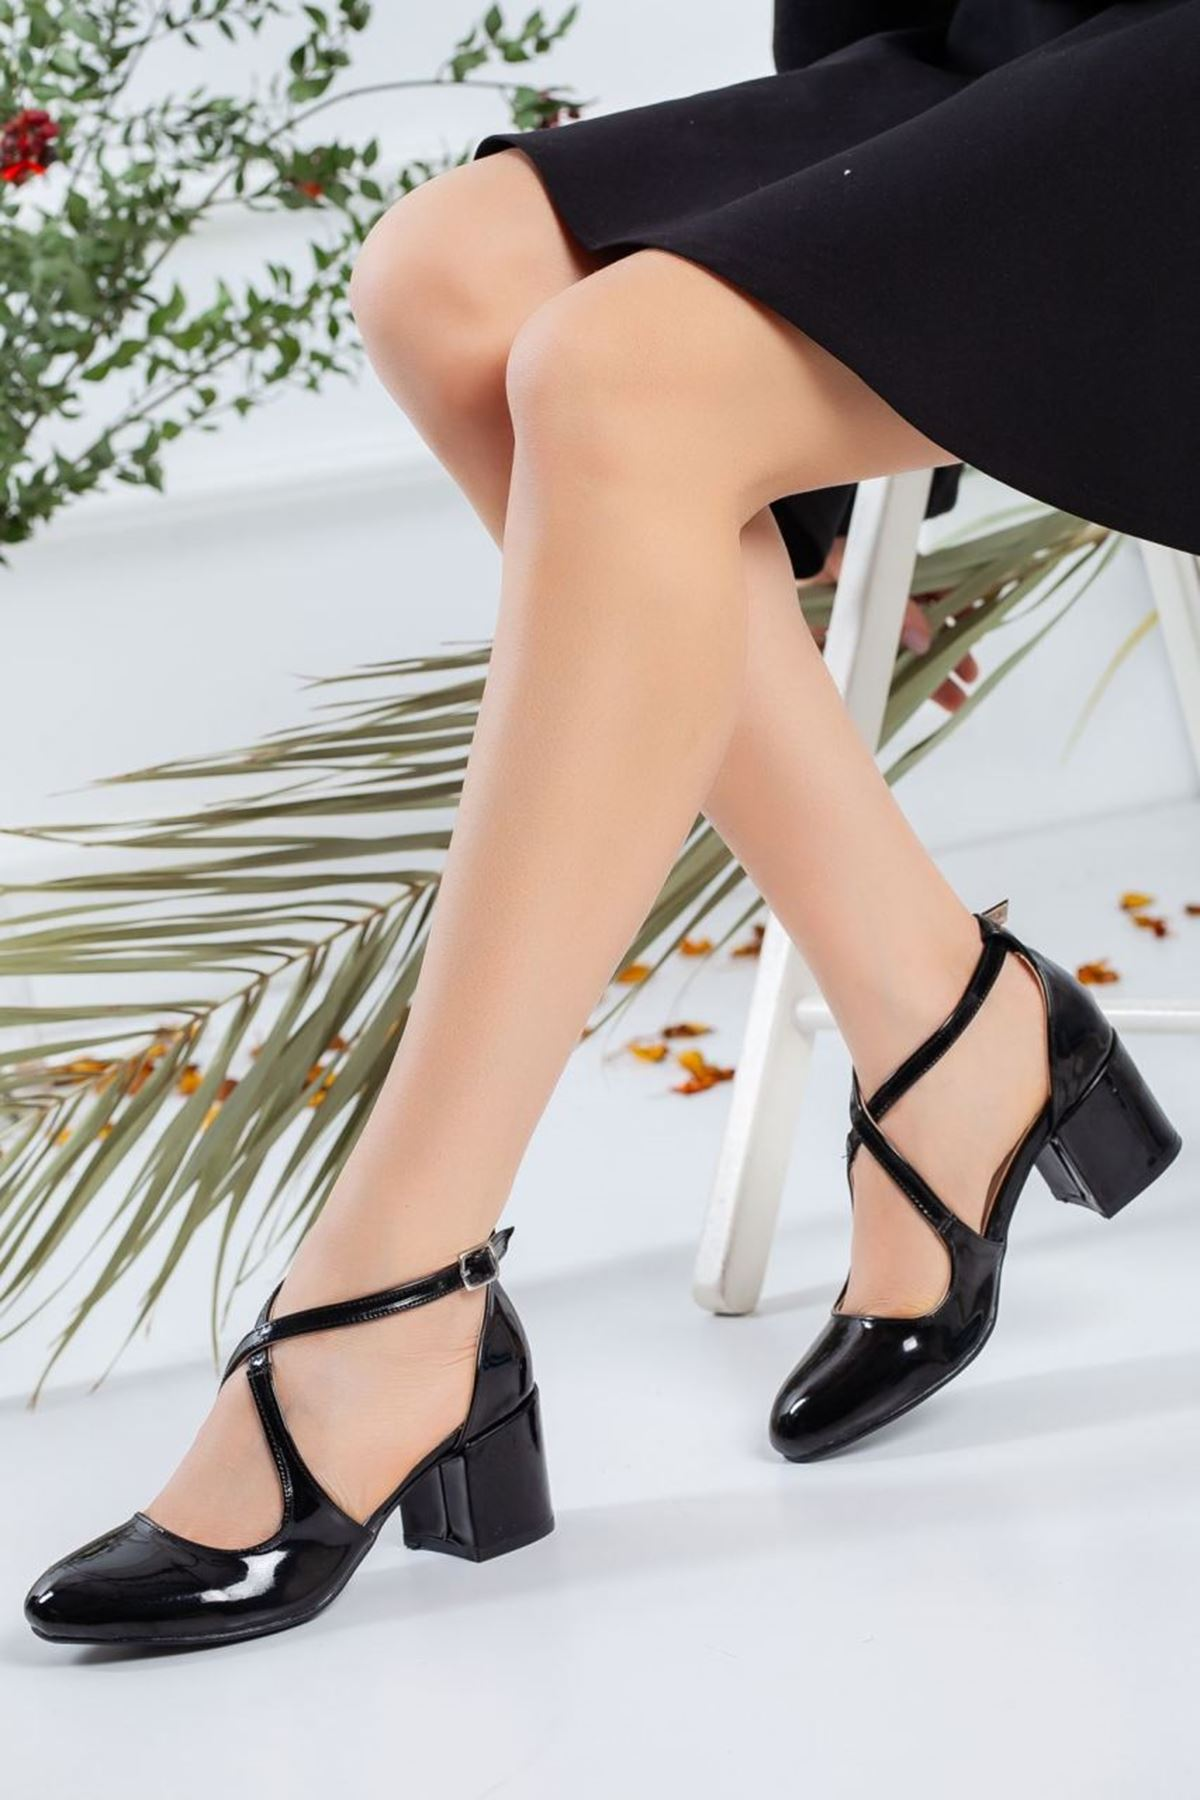 Kadın Garelo Rugan Kısa Topuklu Ayakkabı Siyah